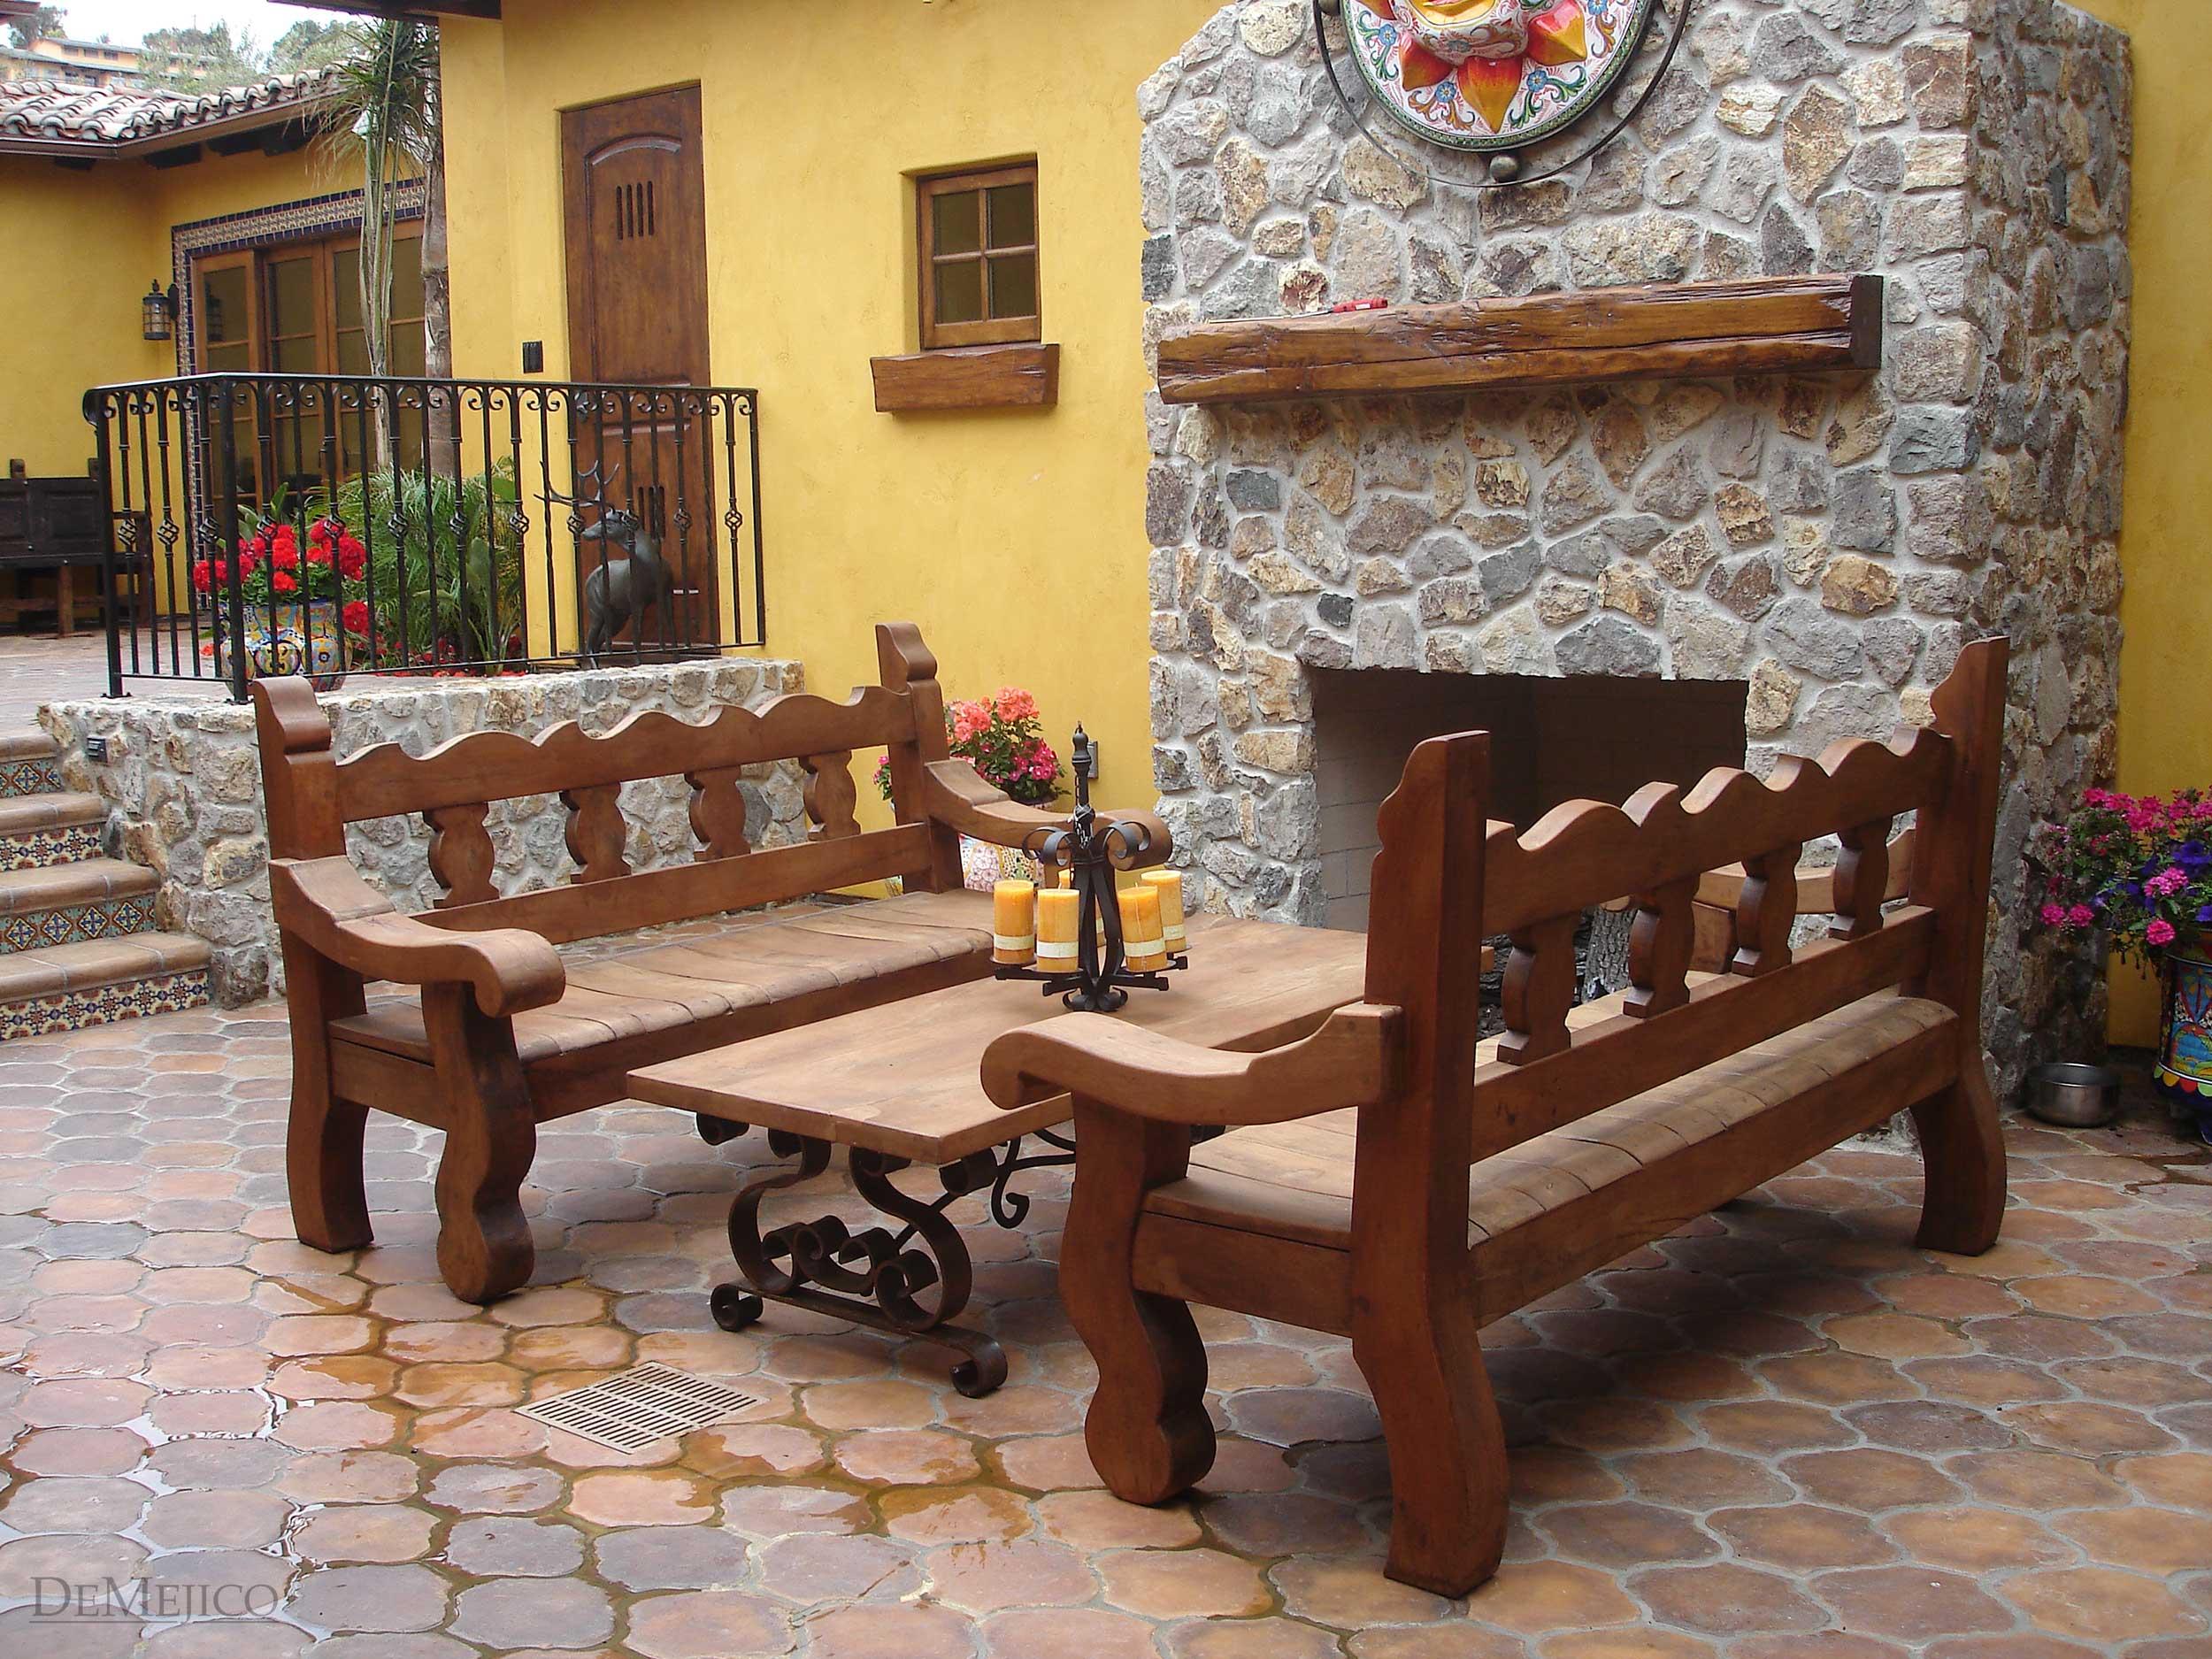 Spanish Furniture, Spanish Outdoor Furniture - Demejico on Mexican Backyard Decor id=29452